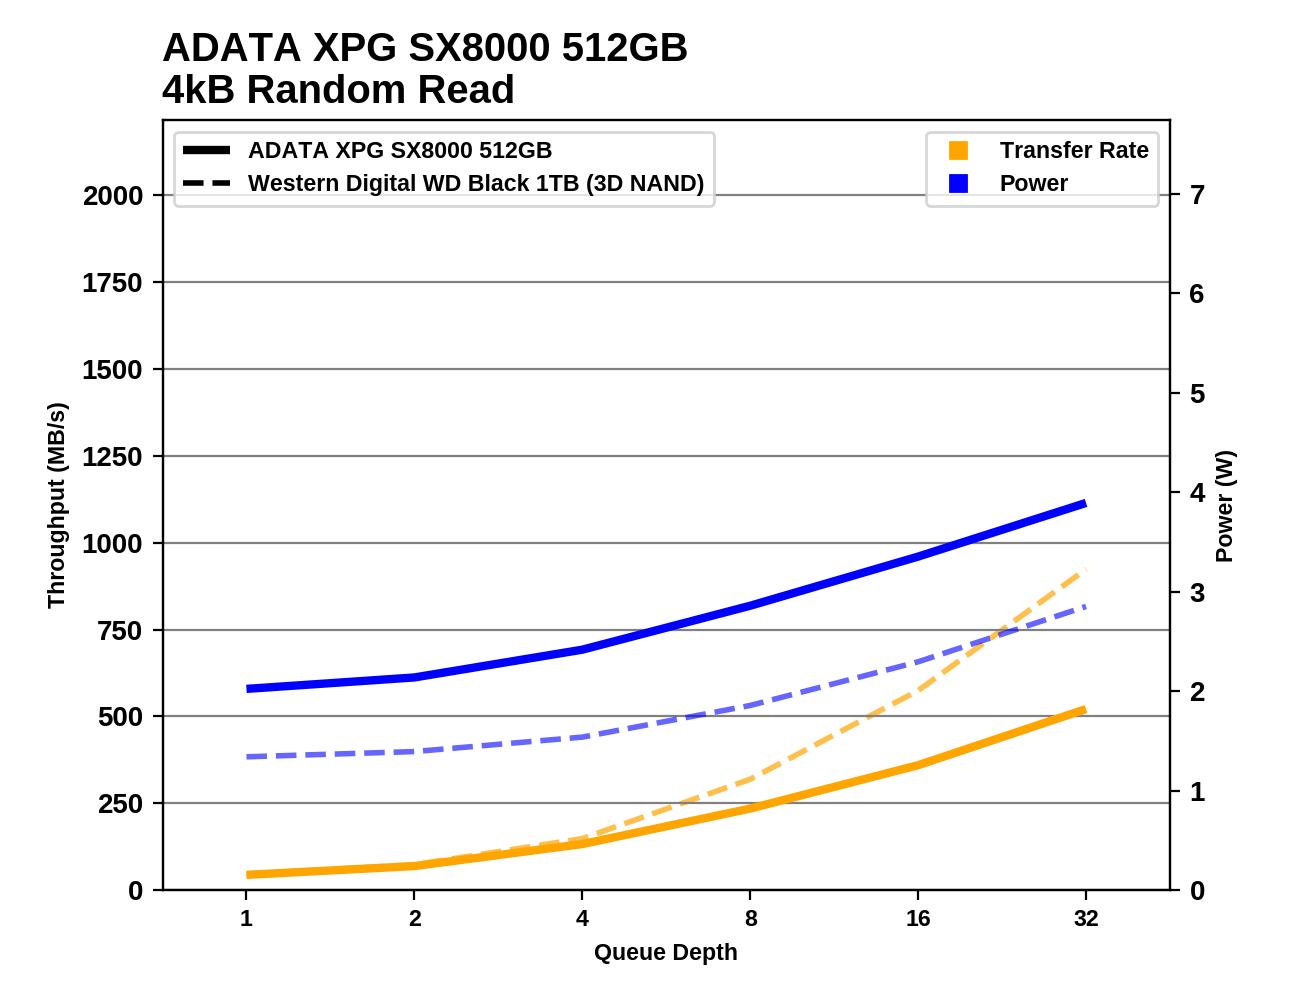 Обзор Western Digital WD Black 3D NAND SSD: EVO встретил равного - 45